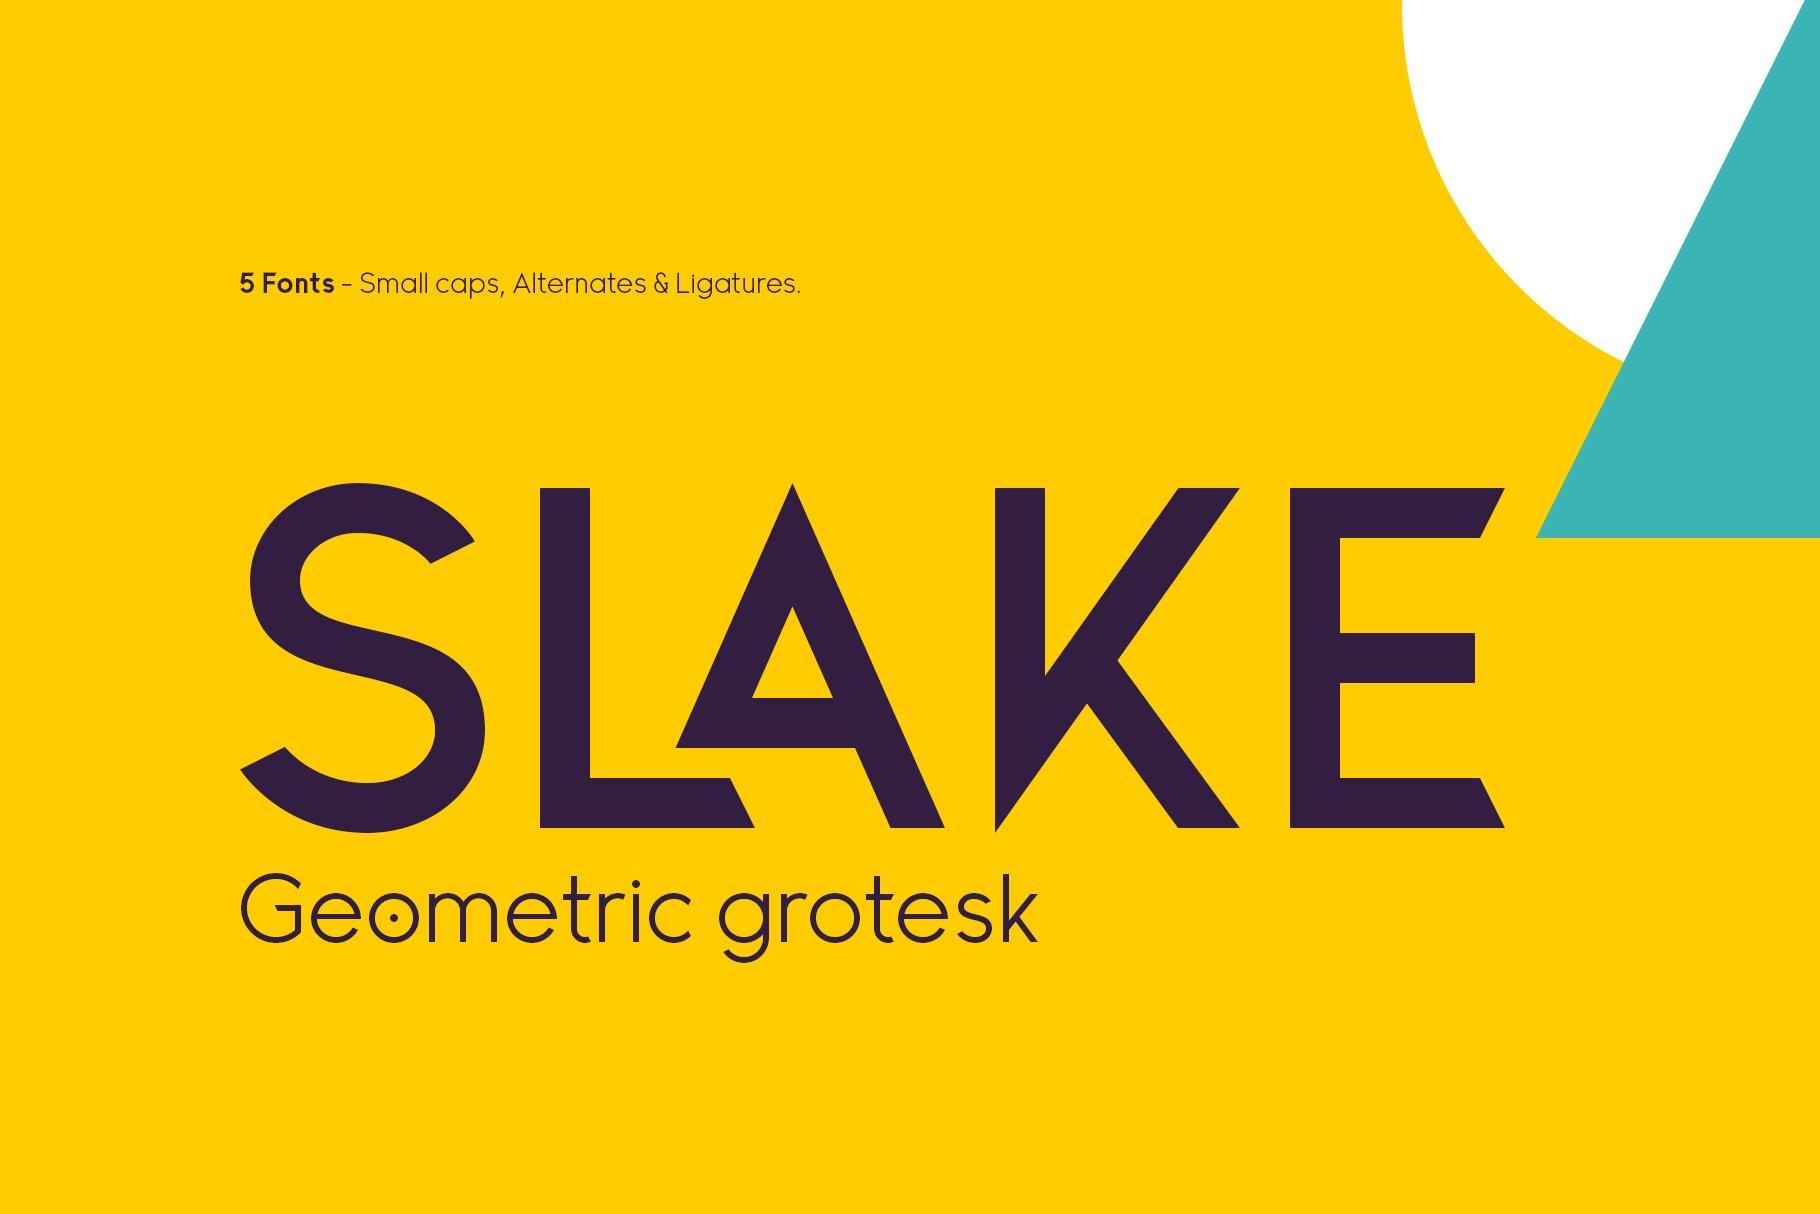 Slake-Sans-Serif-Typeface-www.mockuphill.com